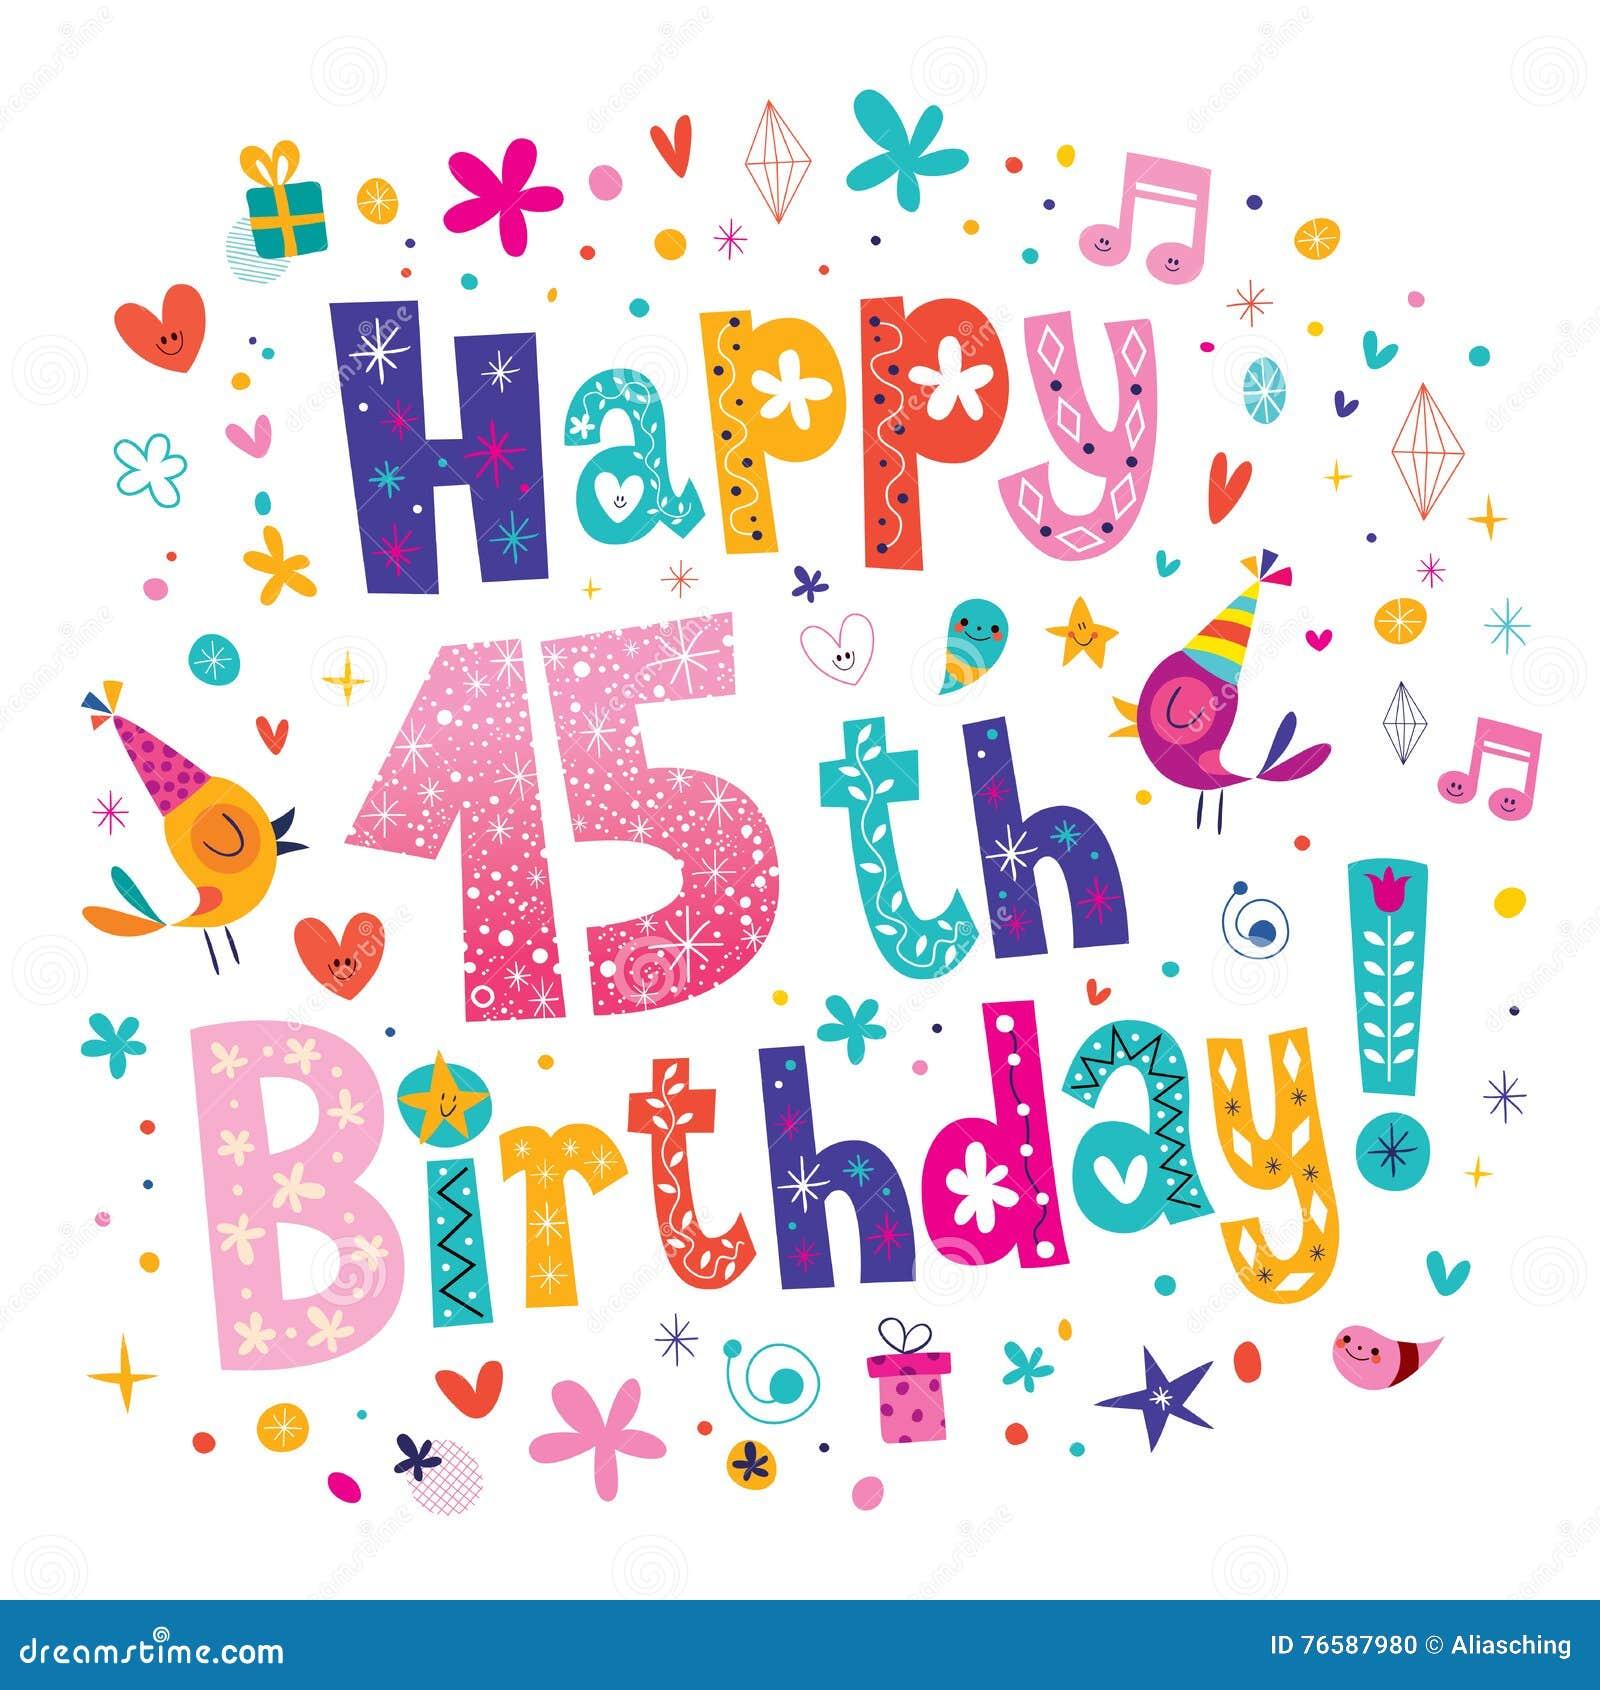 Happy 15th Birthday Greeting Card Vector Image 76587980 – 15th Birthday Card